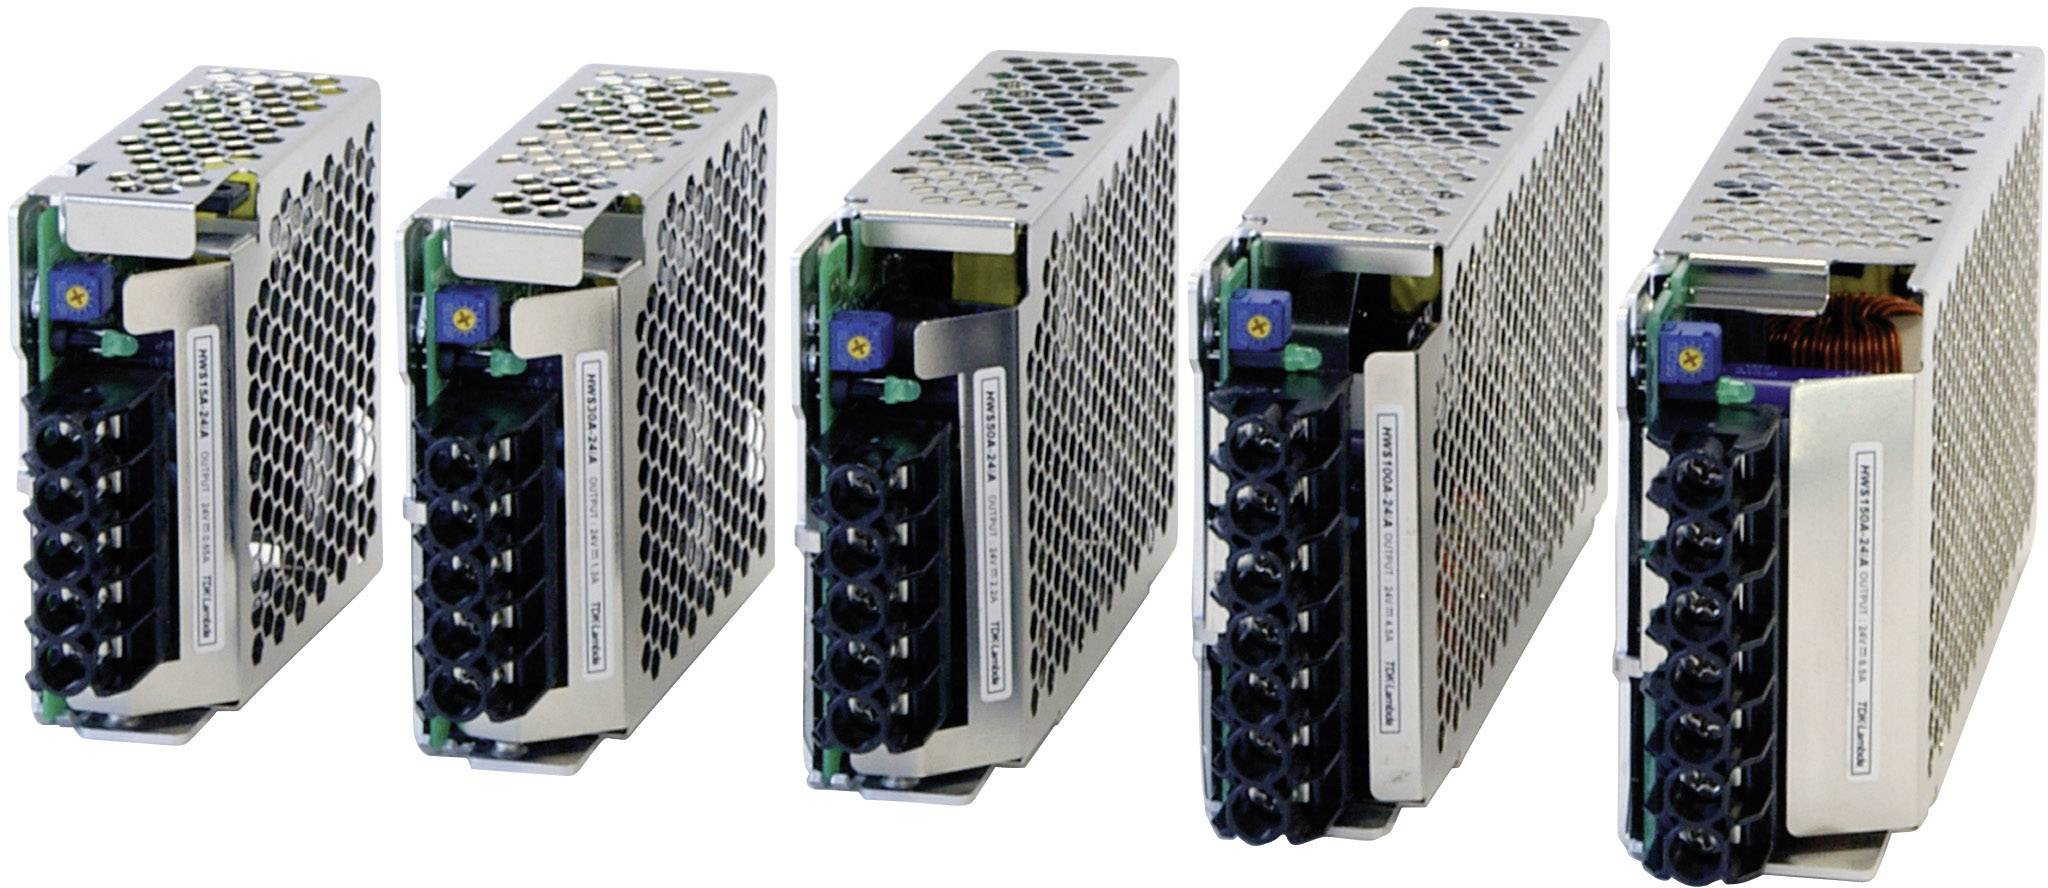 Zabudovateľný napájací zdroj TDK-Lambda HWS-15A-48, 48 V, 15,8 W